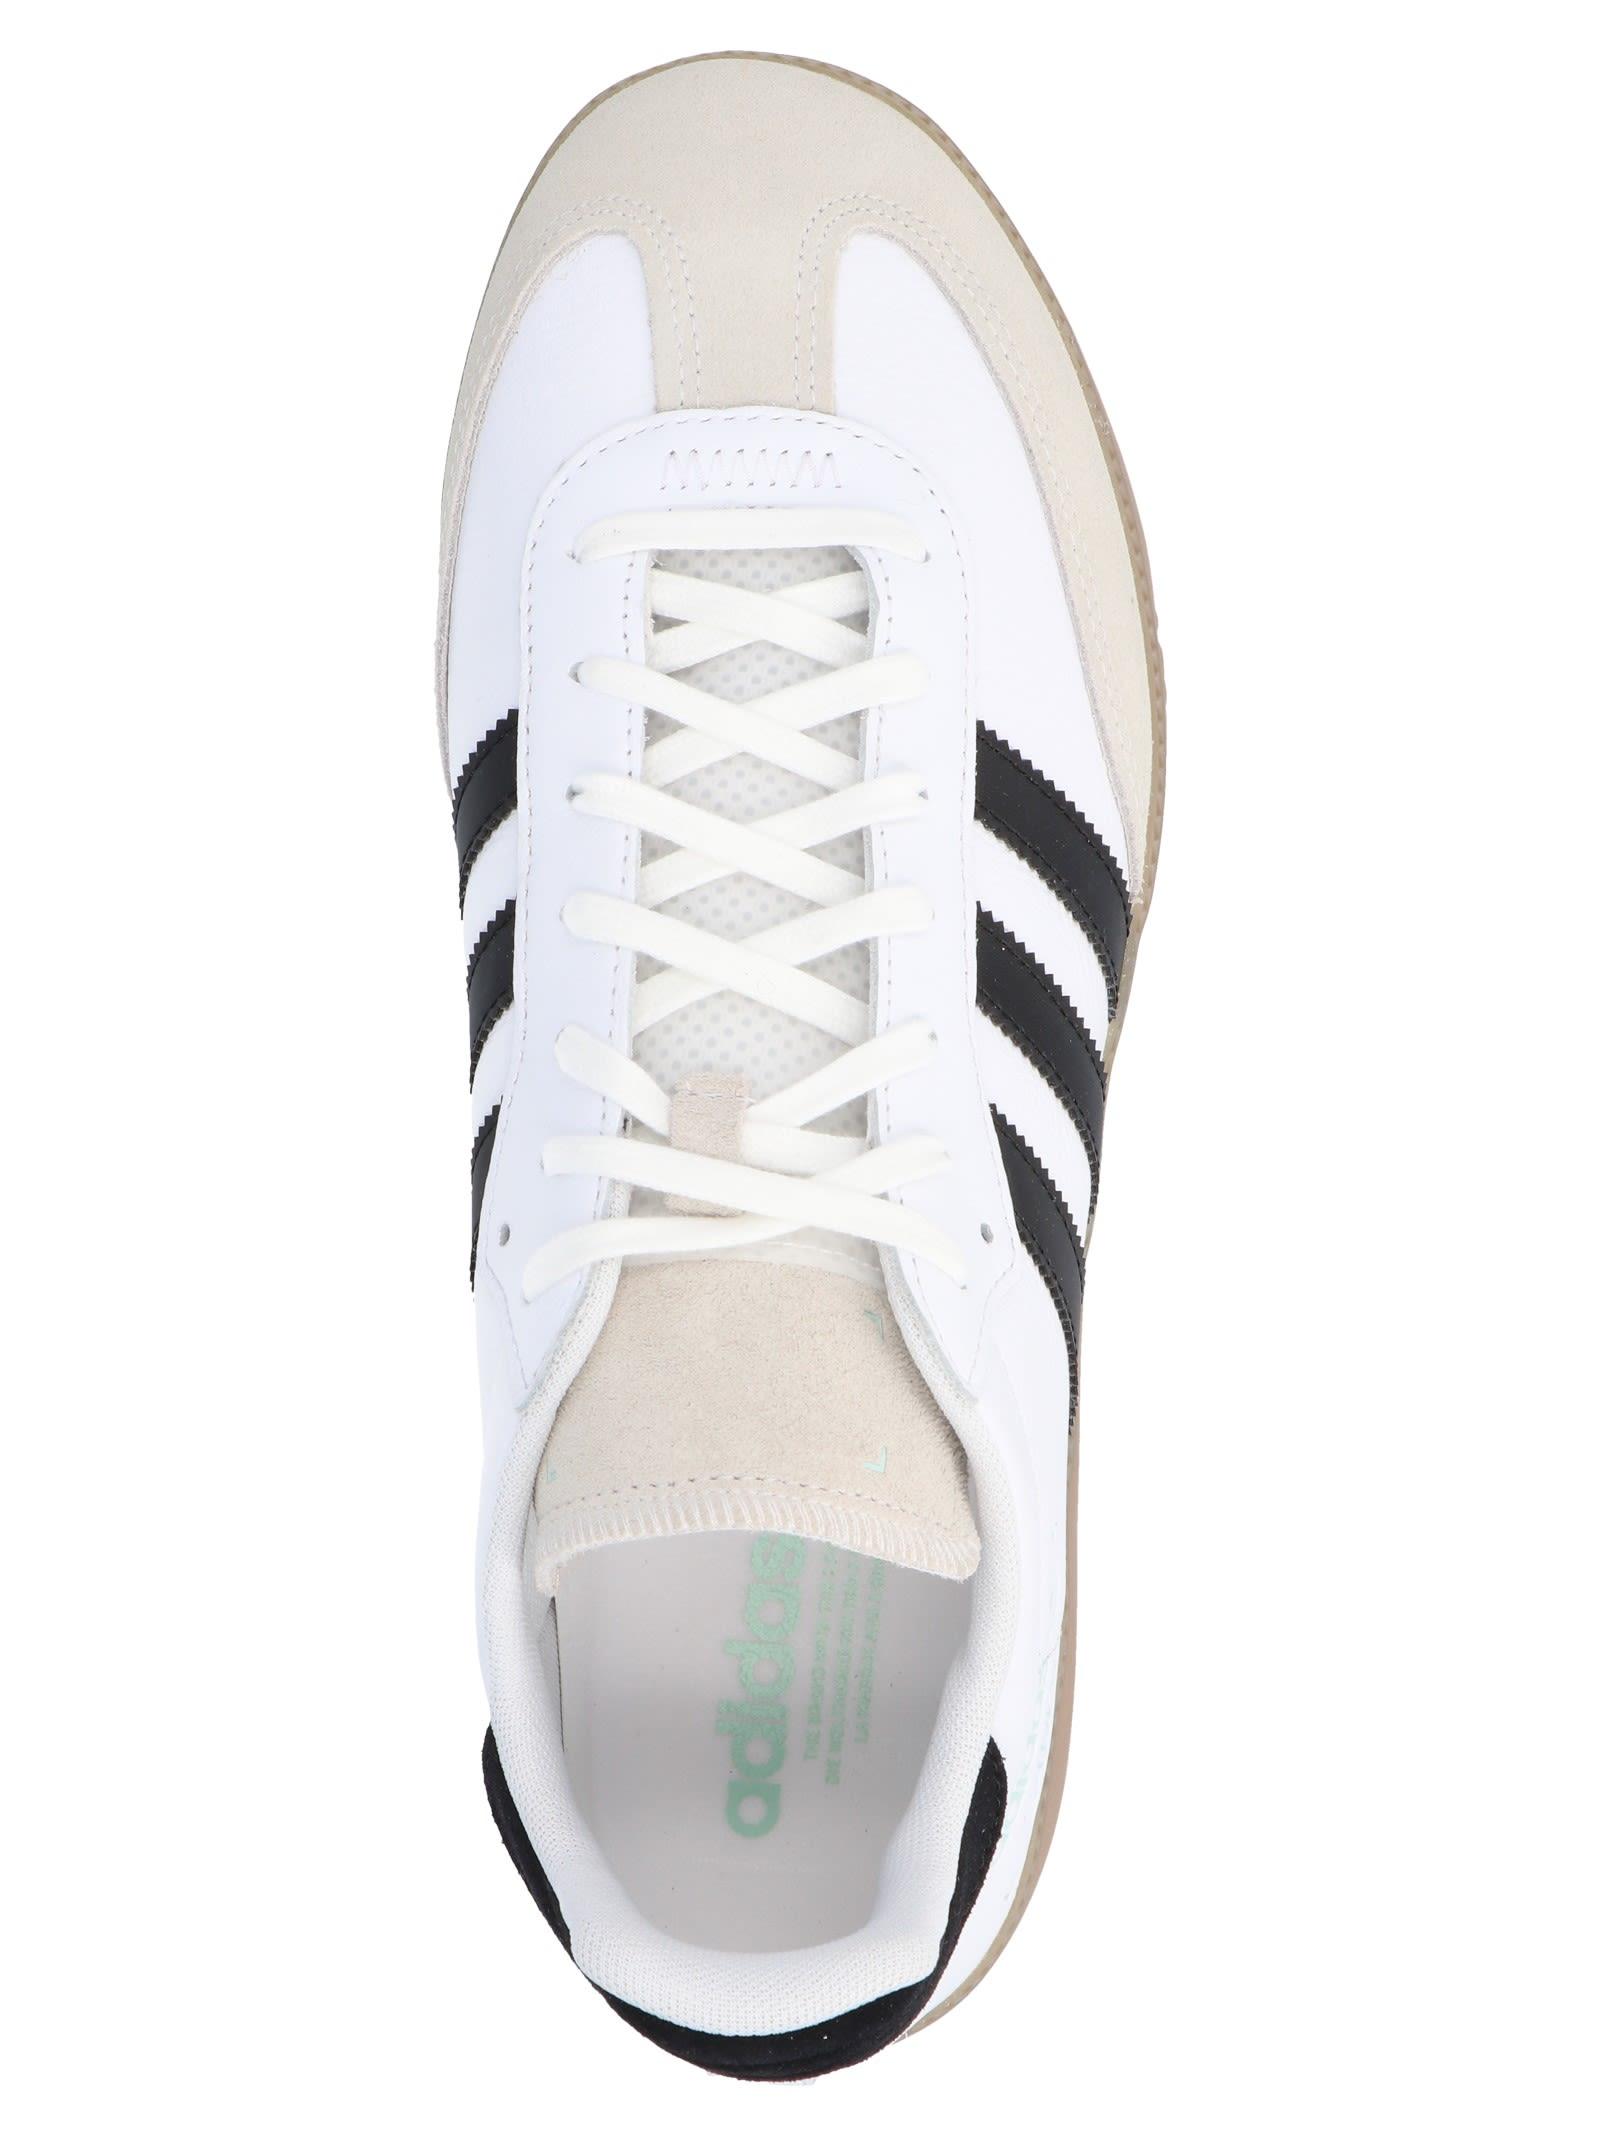 sports shoes 5954b 45837 ... Adidas Originals  samba Rm  Shoes - Black White